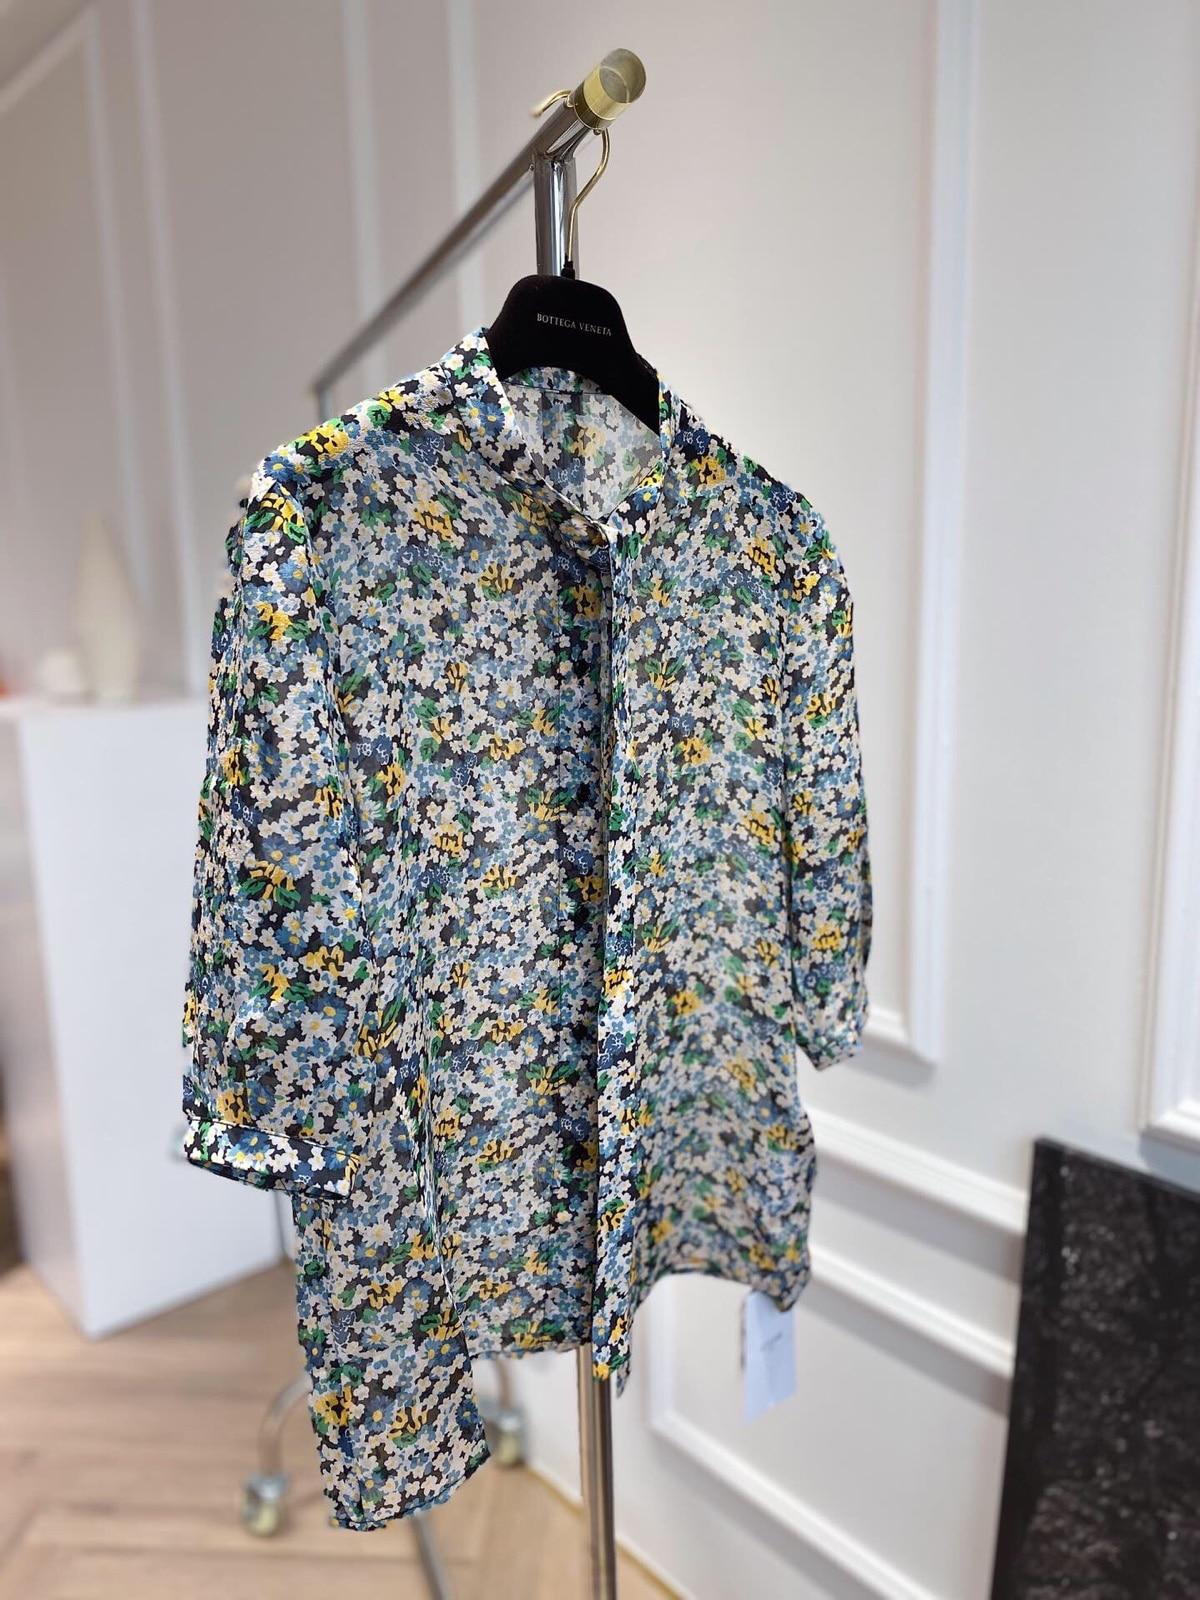 Bom Dia! Textura completa camisa de seda real tremendo temperamento chalaza pequeno suporte chumbo jaqueta sete parte manga dentro construir